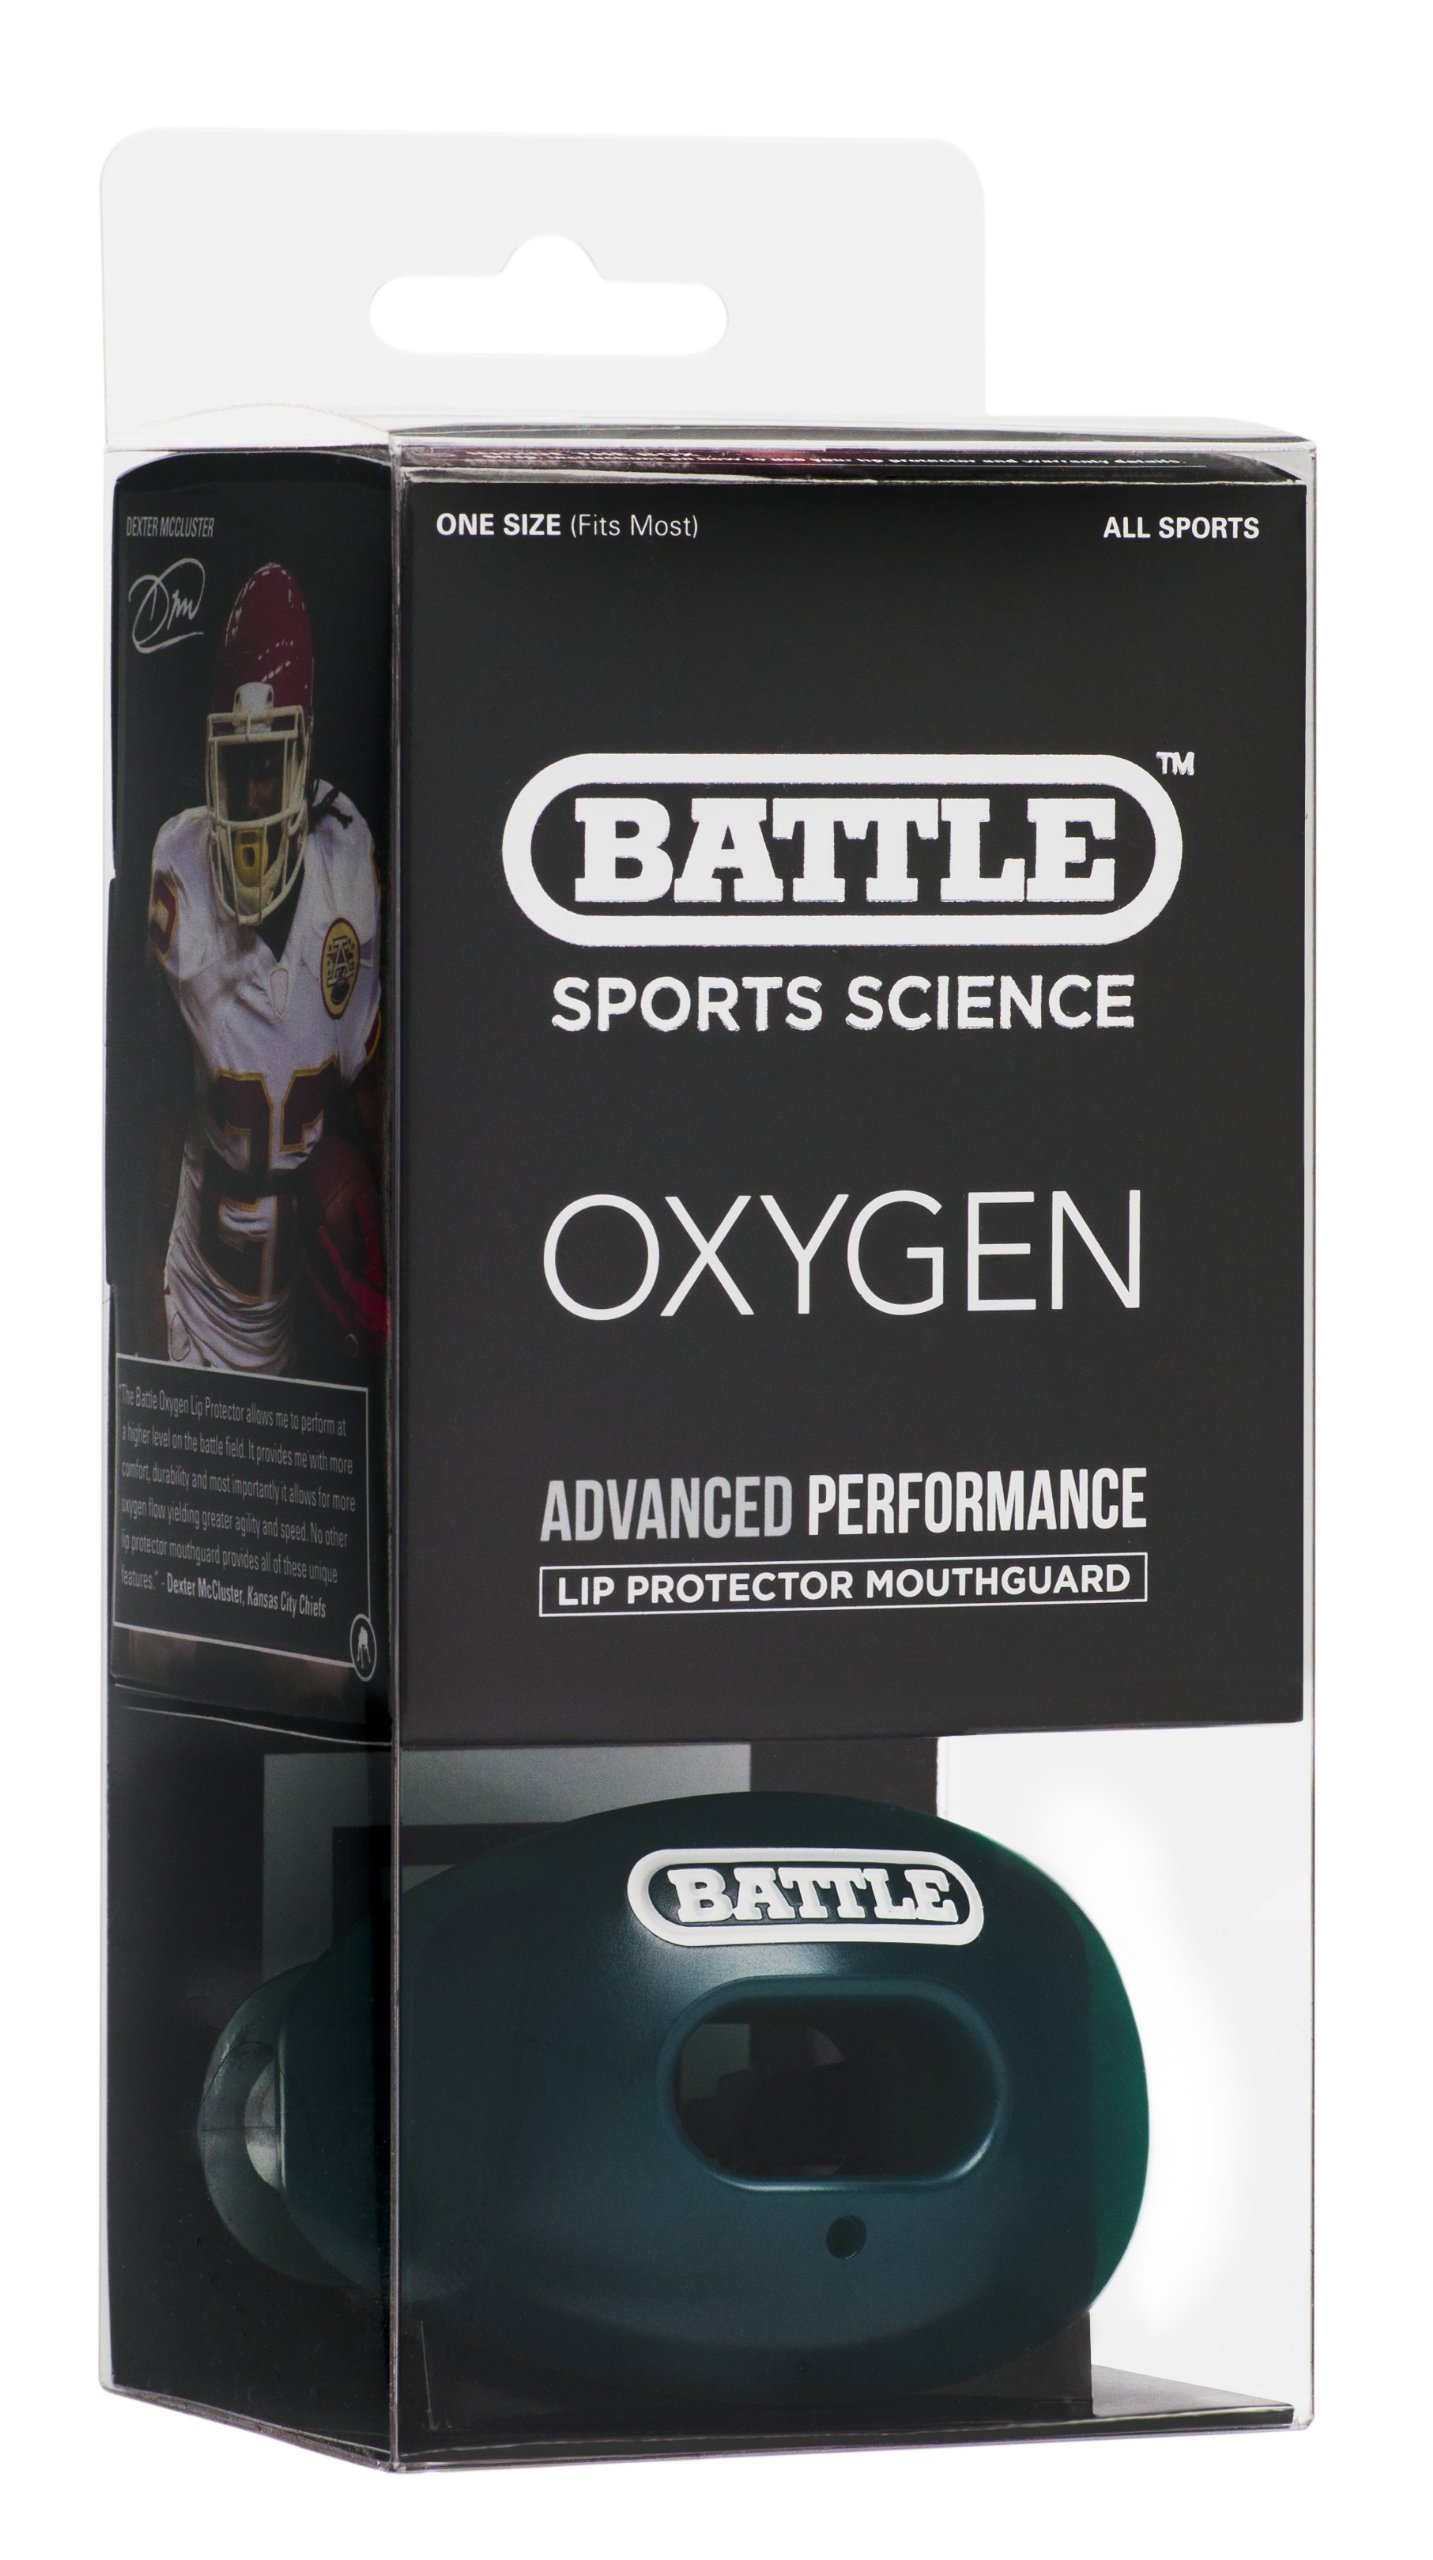 Battle Oxygen Lip Protector Mouthguard, Green by Battle